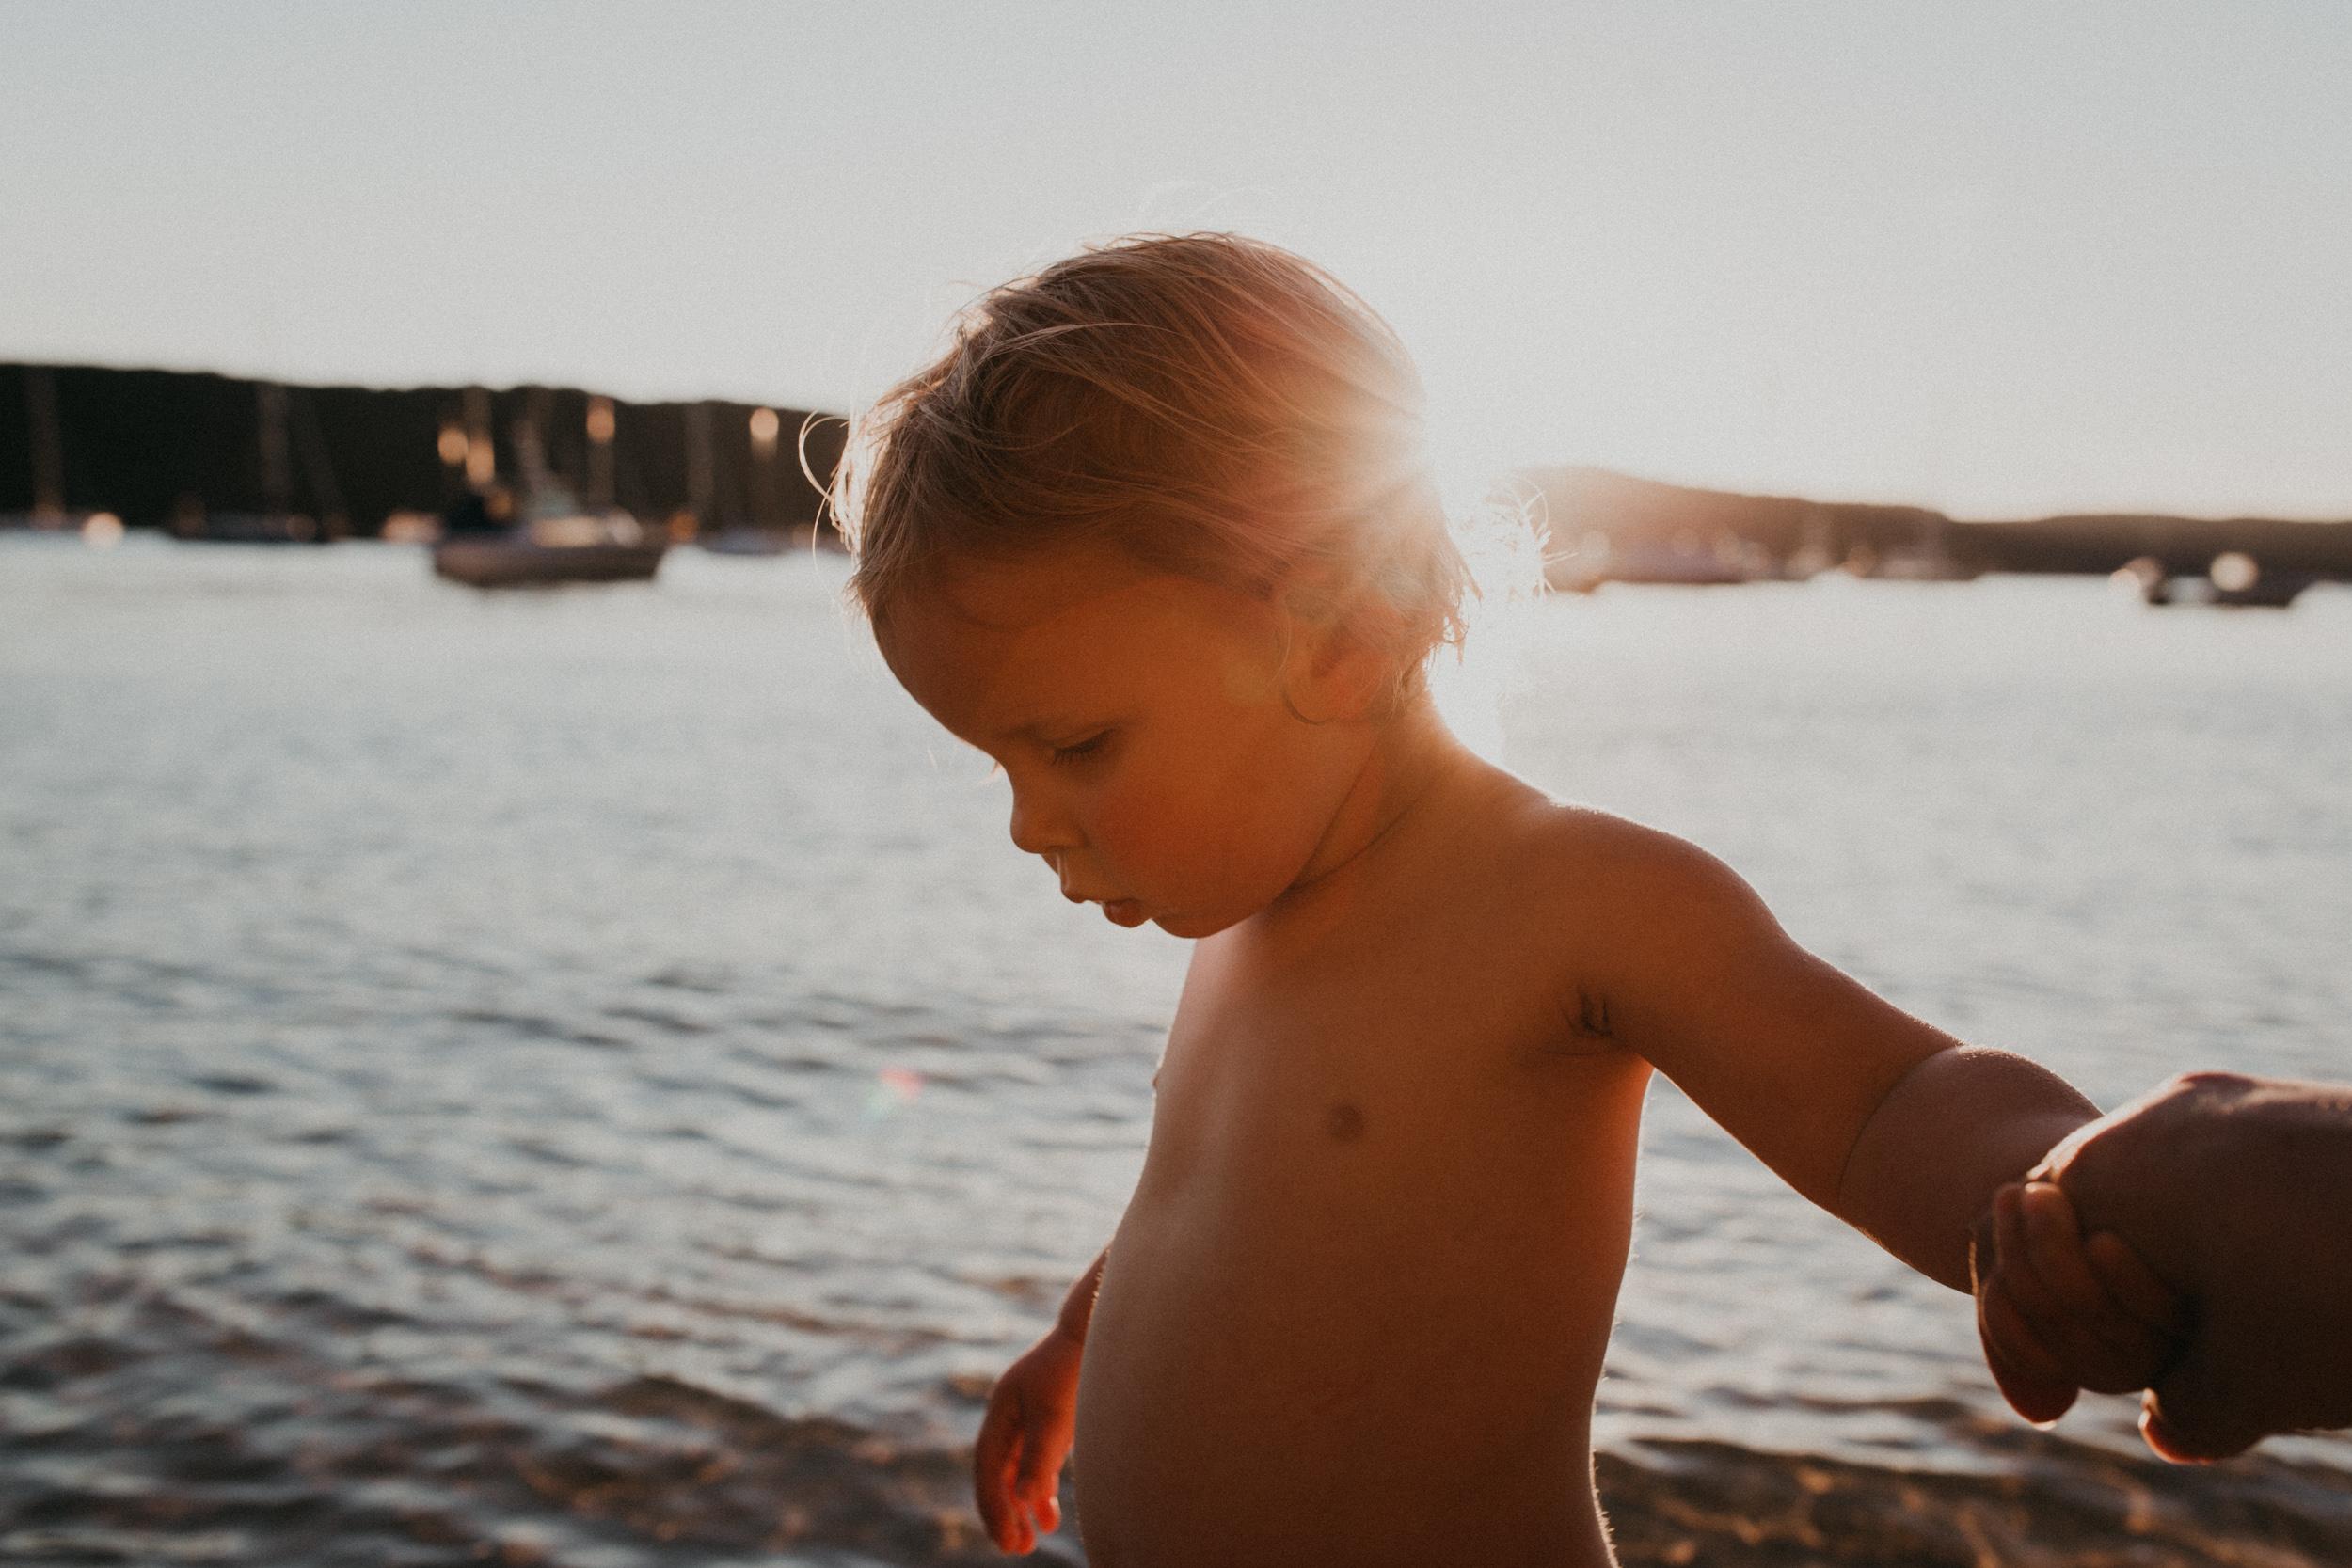 160927-Kids-Paradise-Beach-Pittwater-094-Deanna-Gerlach.jpg